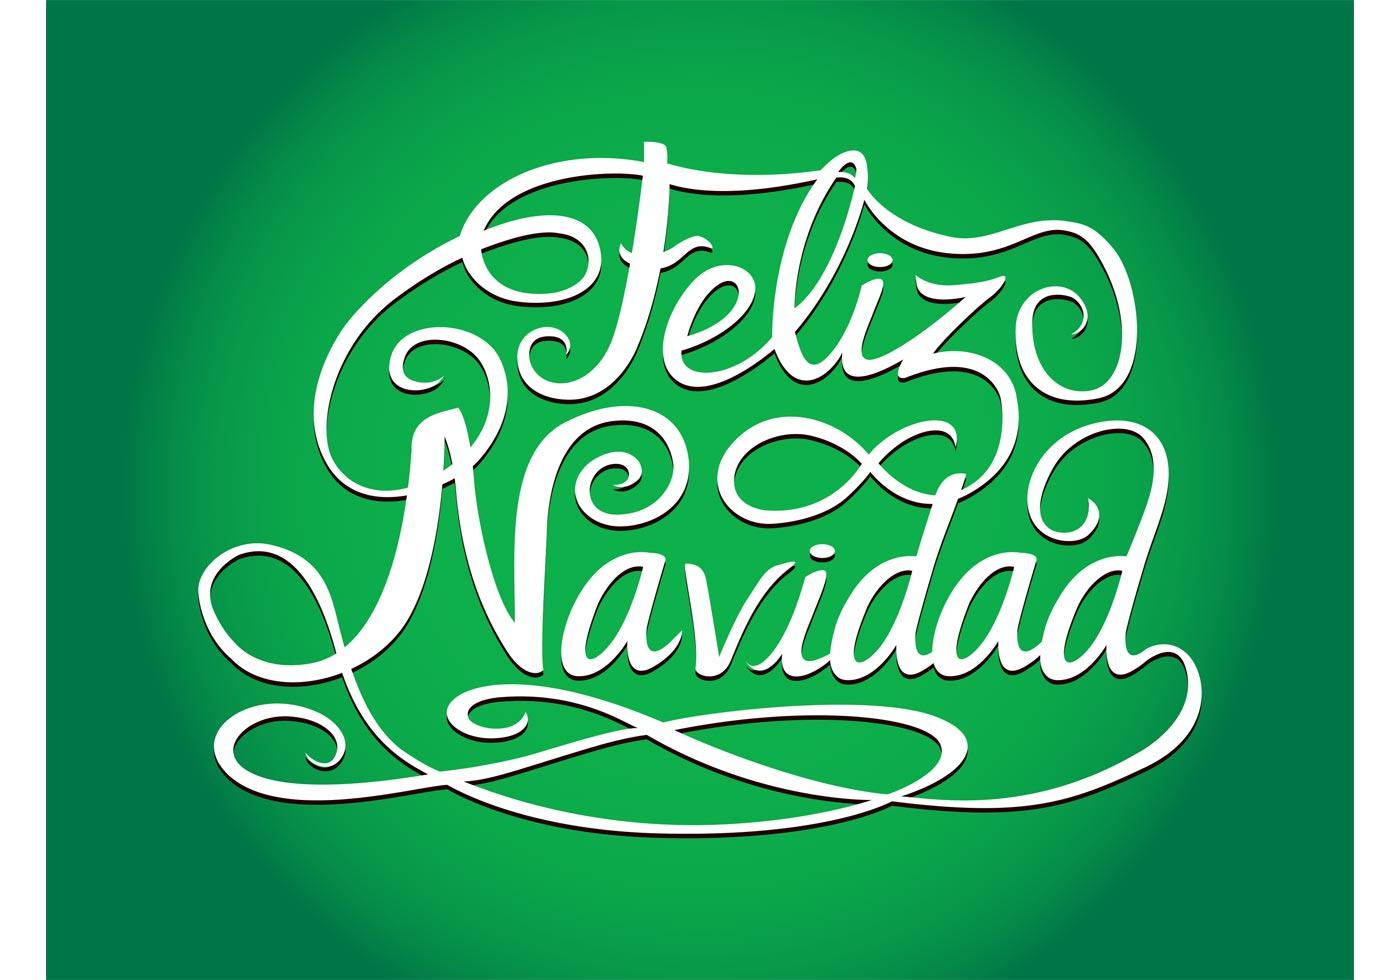 Spanish Christmas Greetings - Download Free Vector Art ...